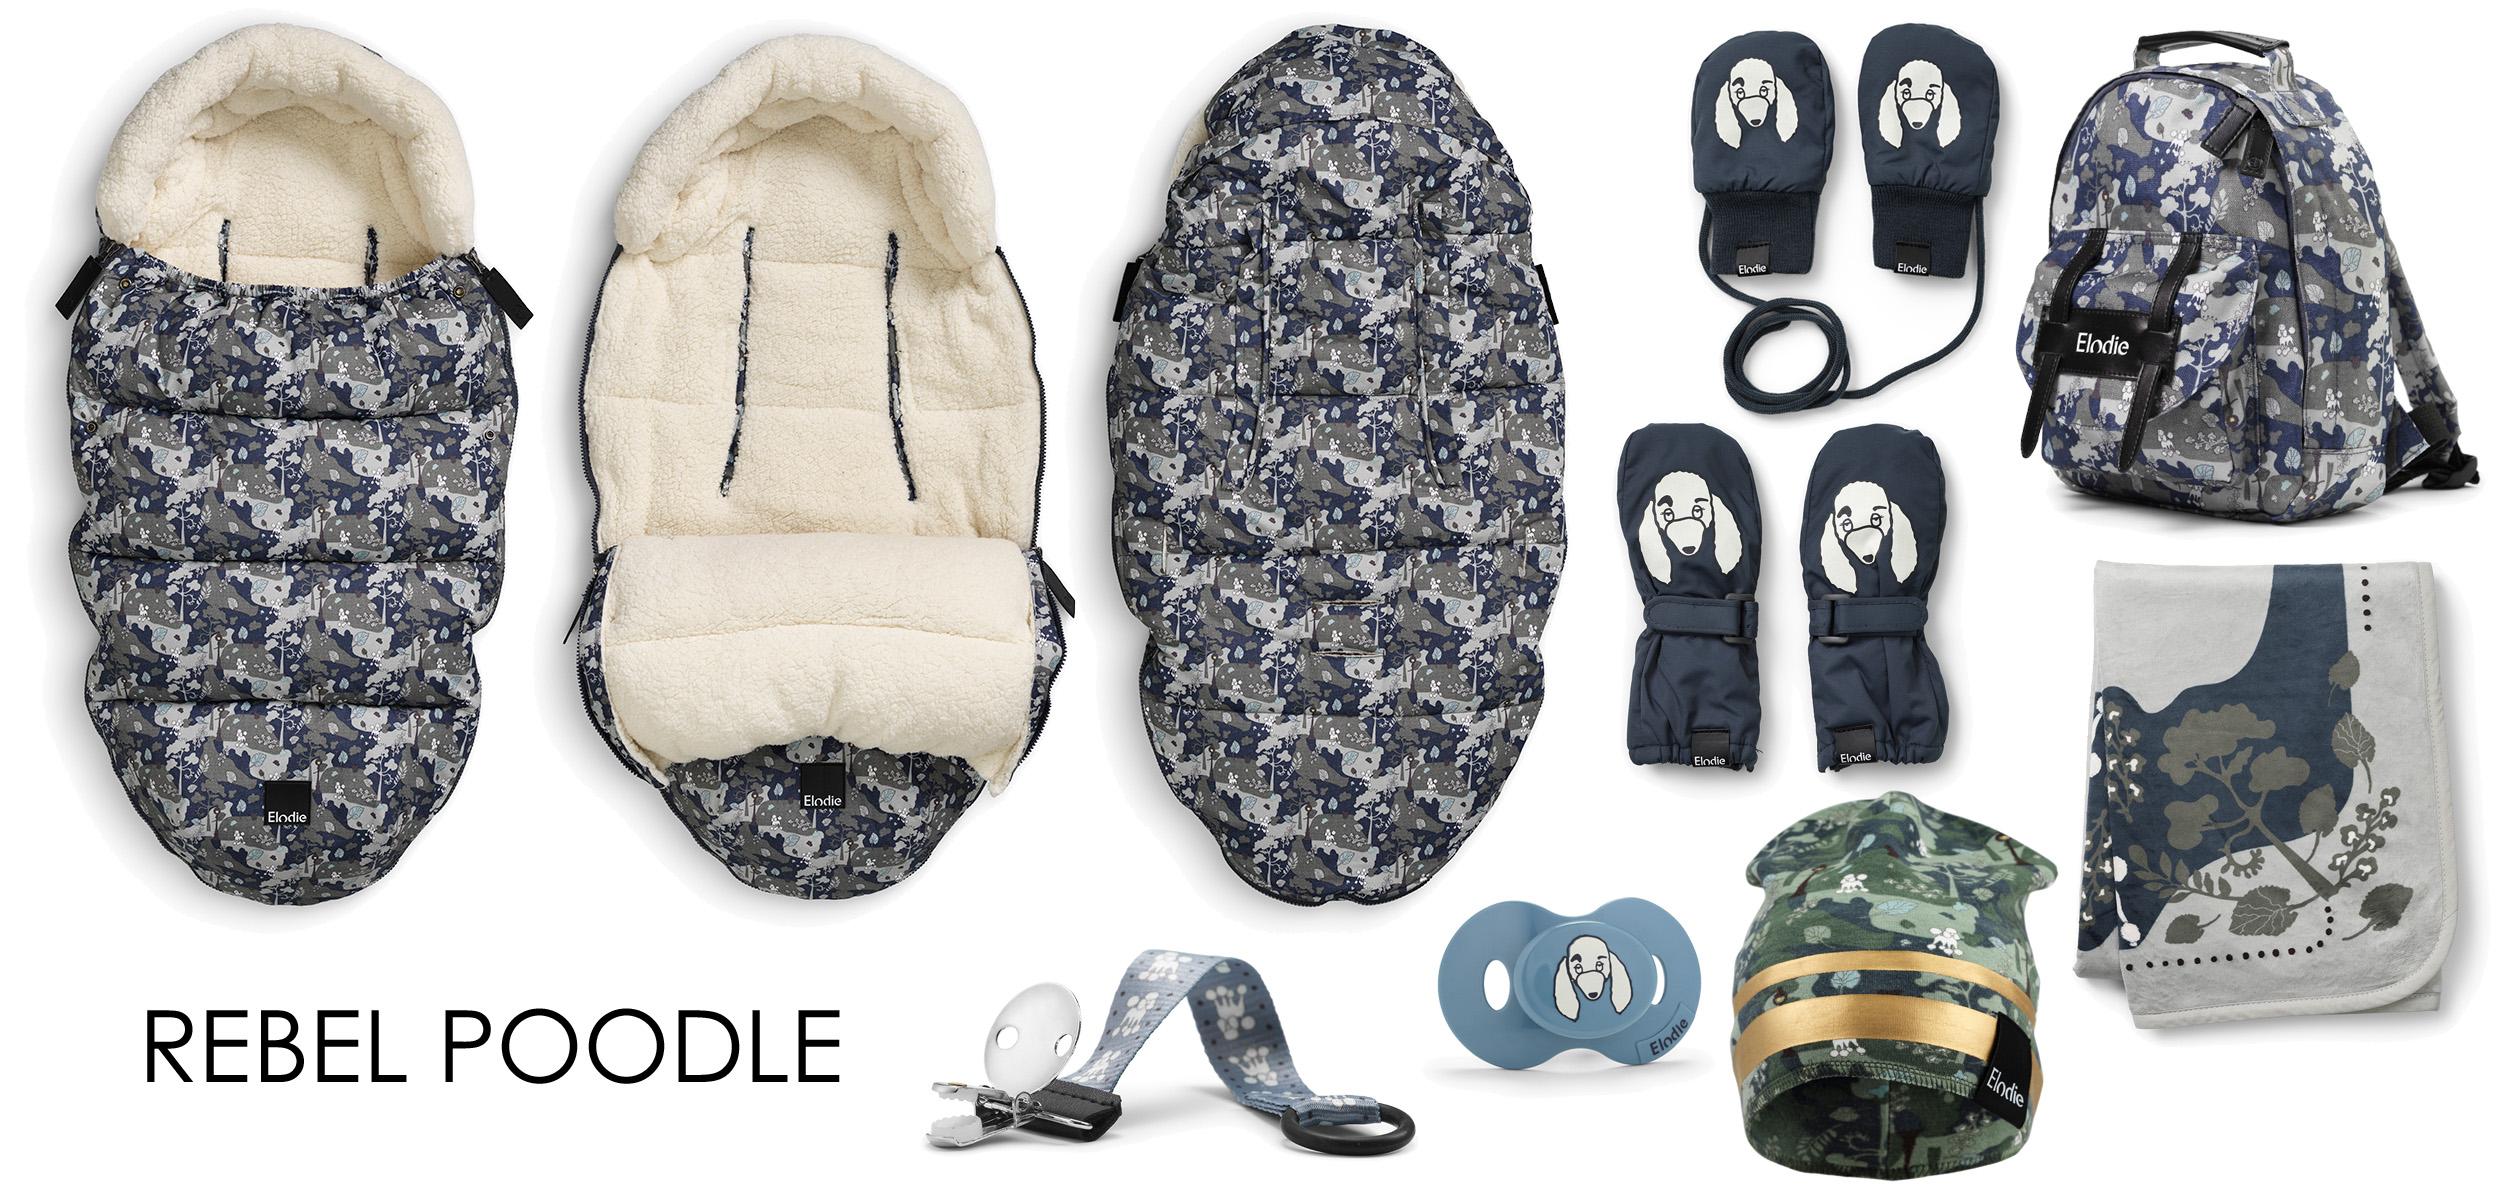 Elodie Details Rebel Poodle Åkpåse